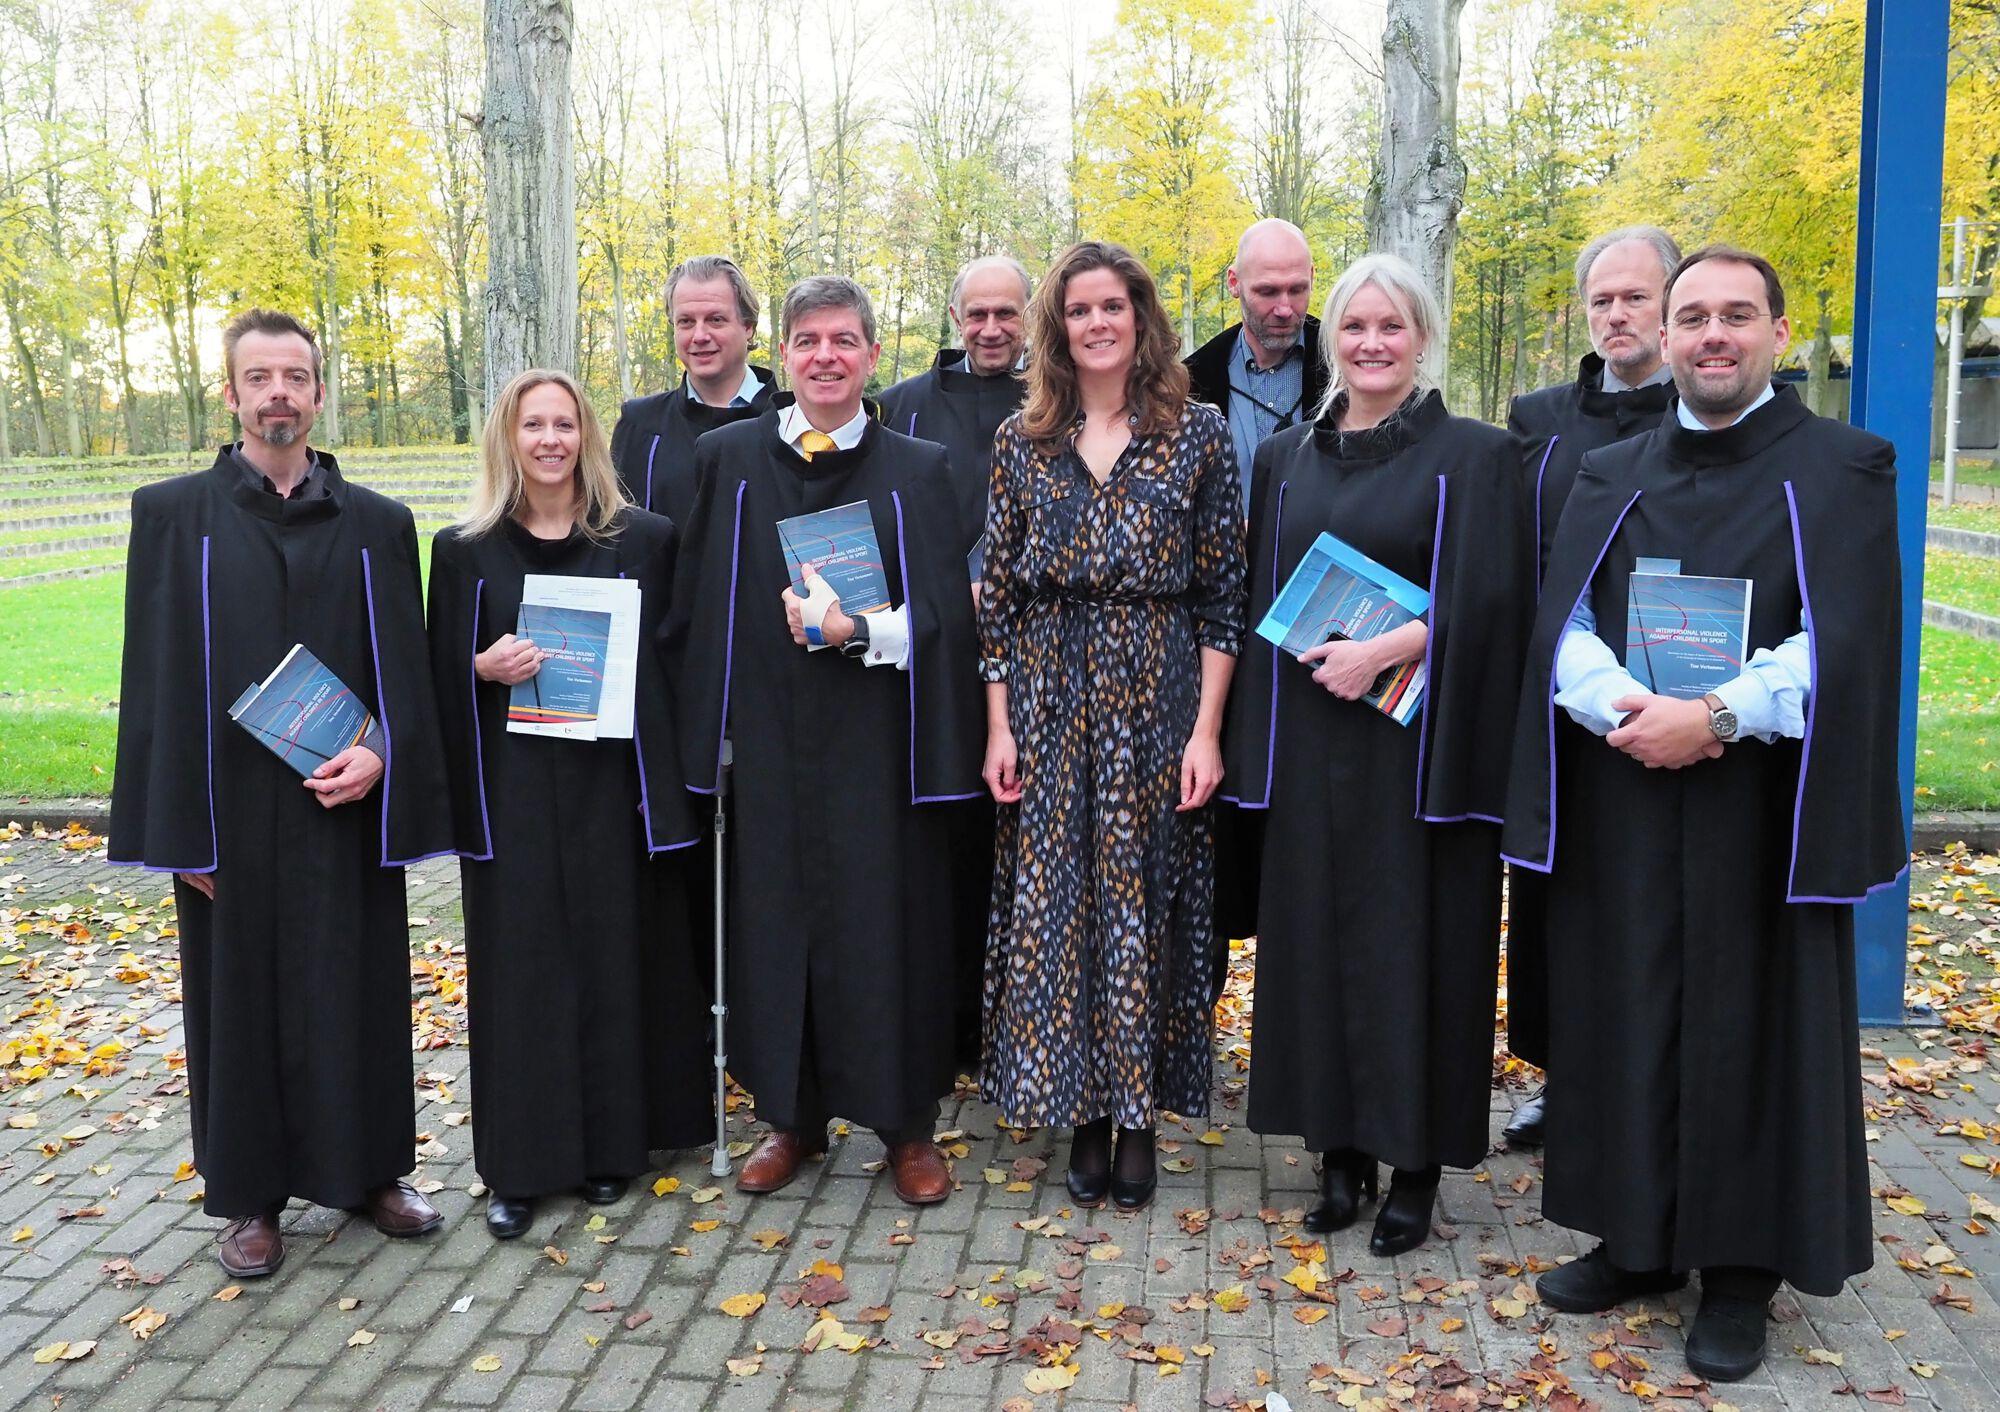 Doctoraatsverdediging Tine Vertommen - 17 november 2017